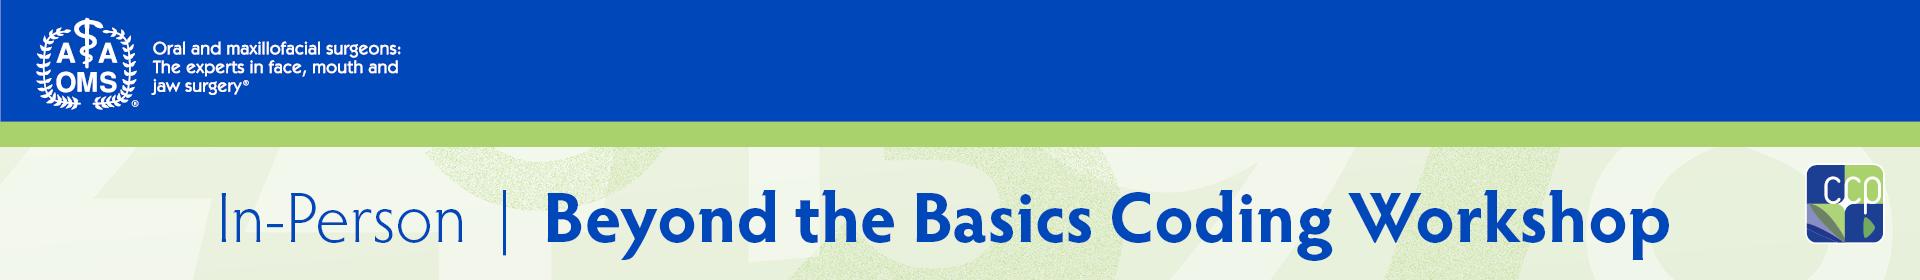 Beyond the Basics Coding Workshop